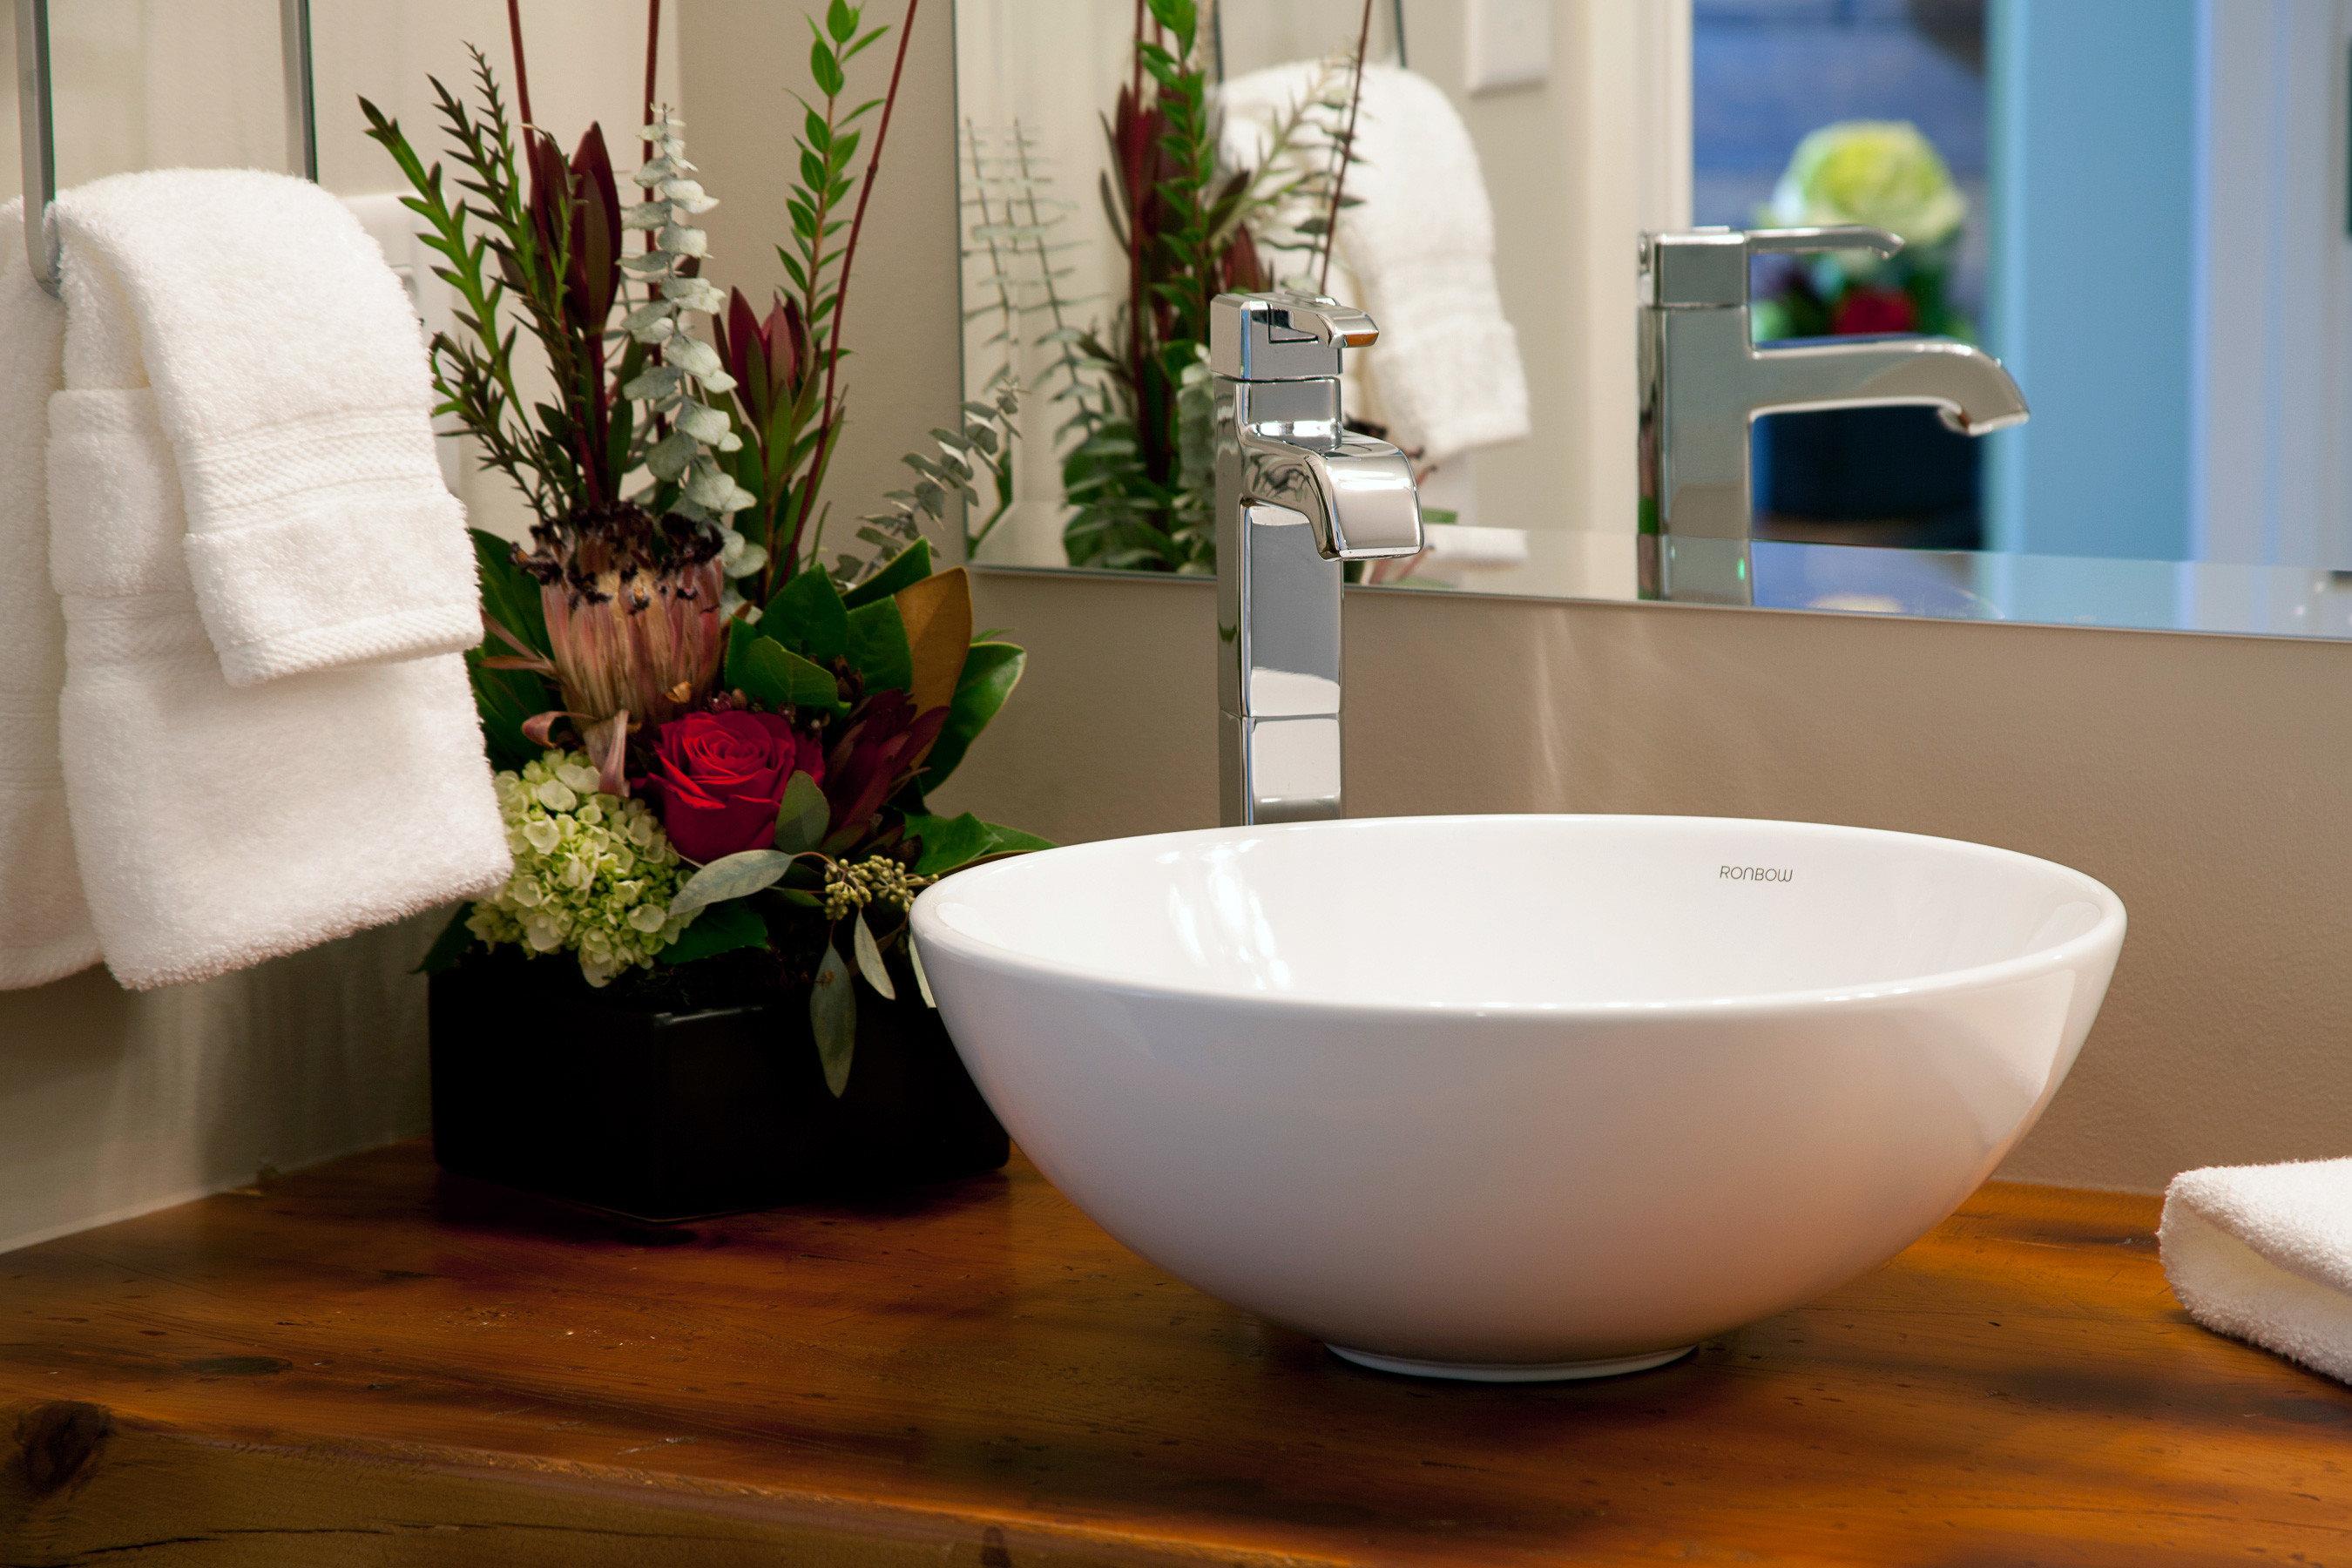 Bath Boutique Rustic bathroom bathtub plumbing fixture ceramic sink bidet home flooring plant